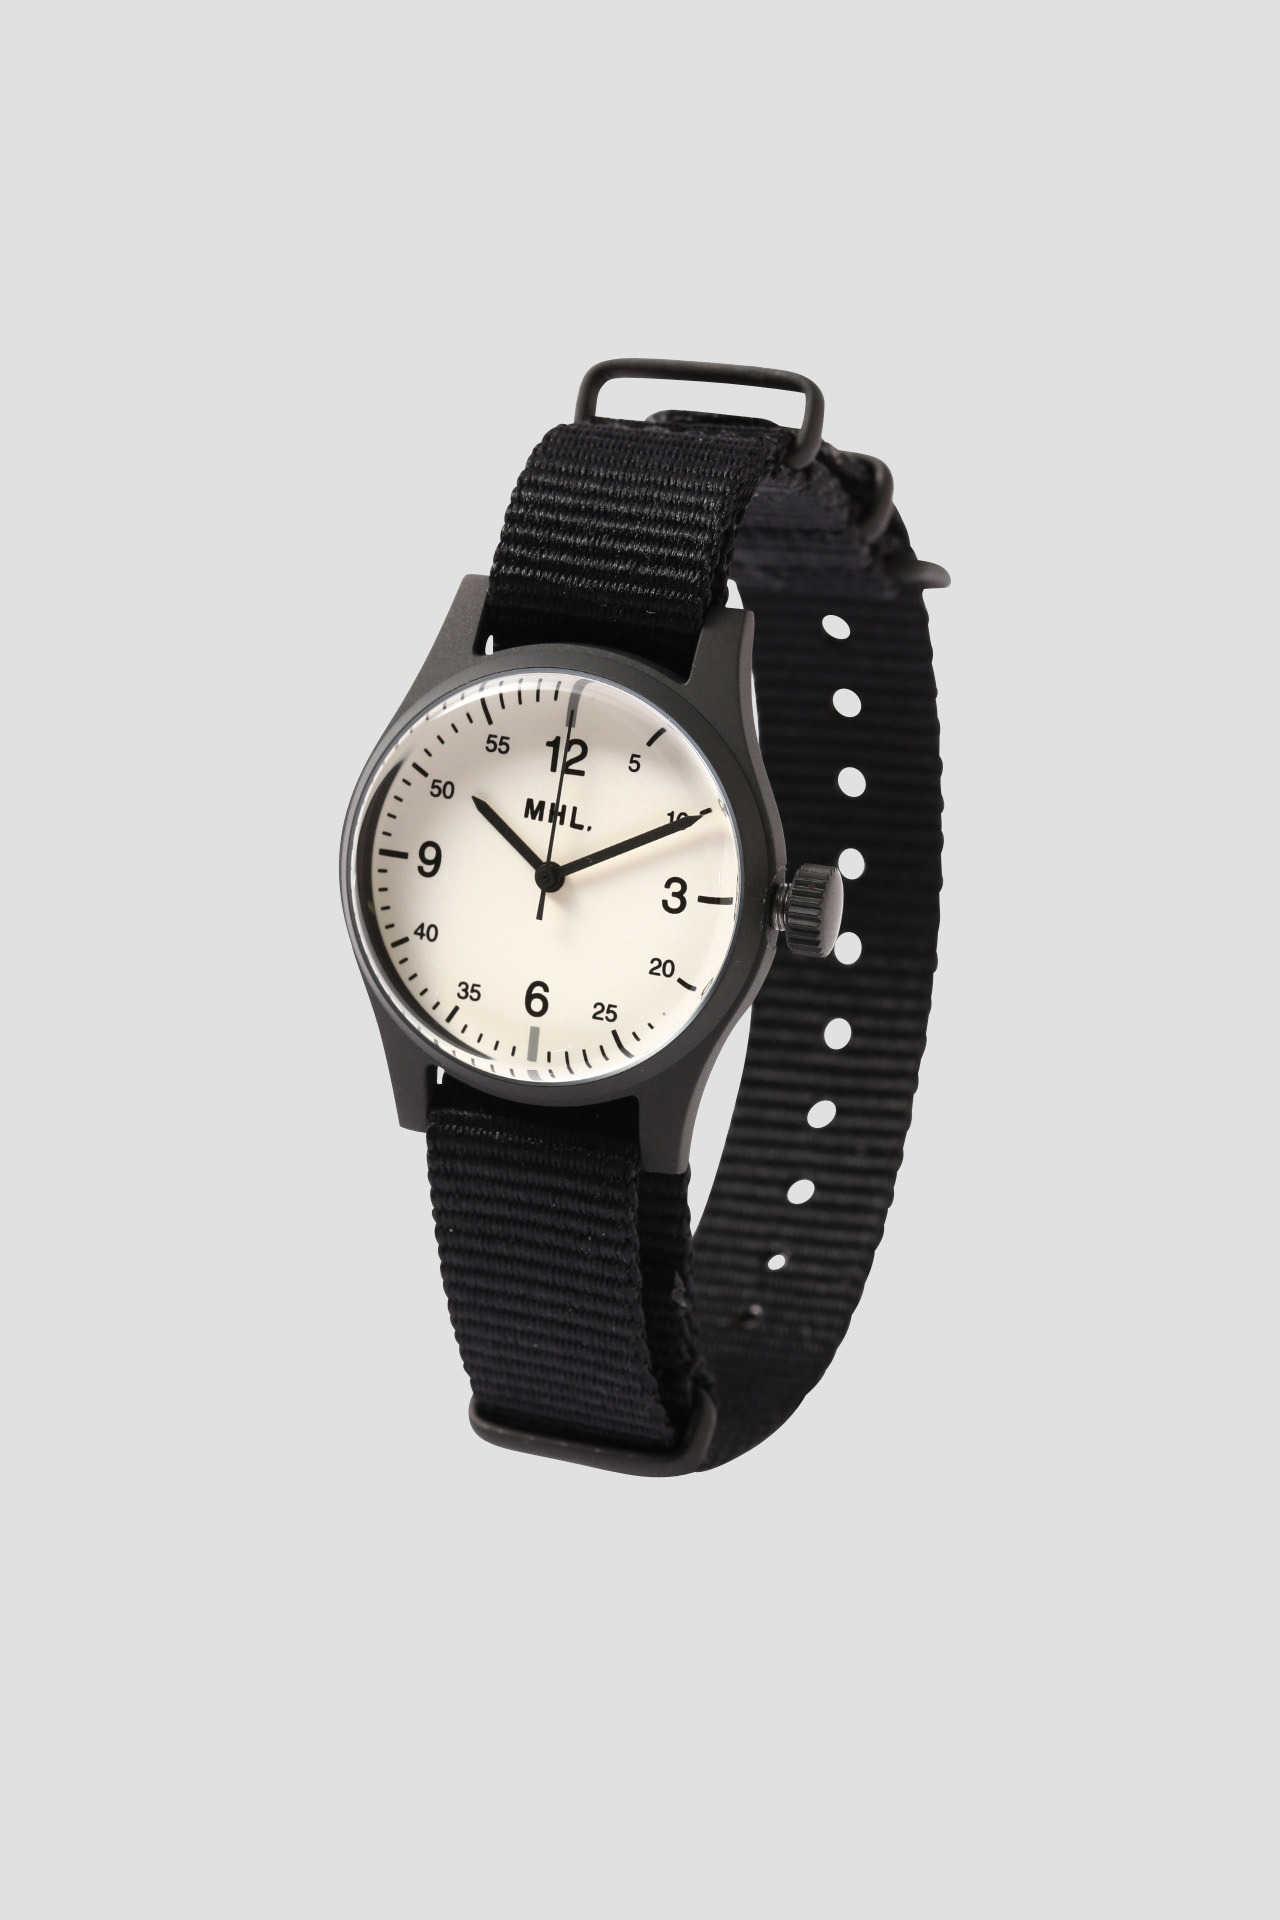 MILITARY WRIST WATCH 軍用の時計をイメージに落とし込んだミリタリーウォッチ。 ¥ 23,000 (+TAX)